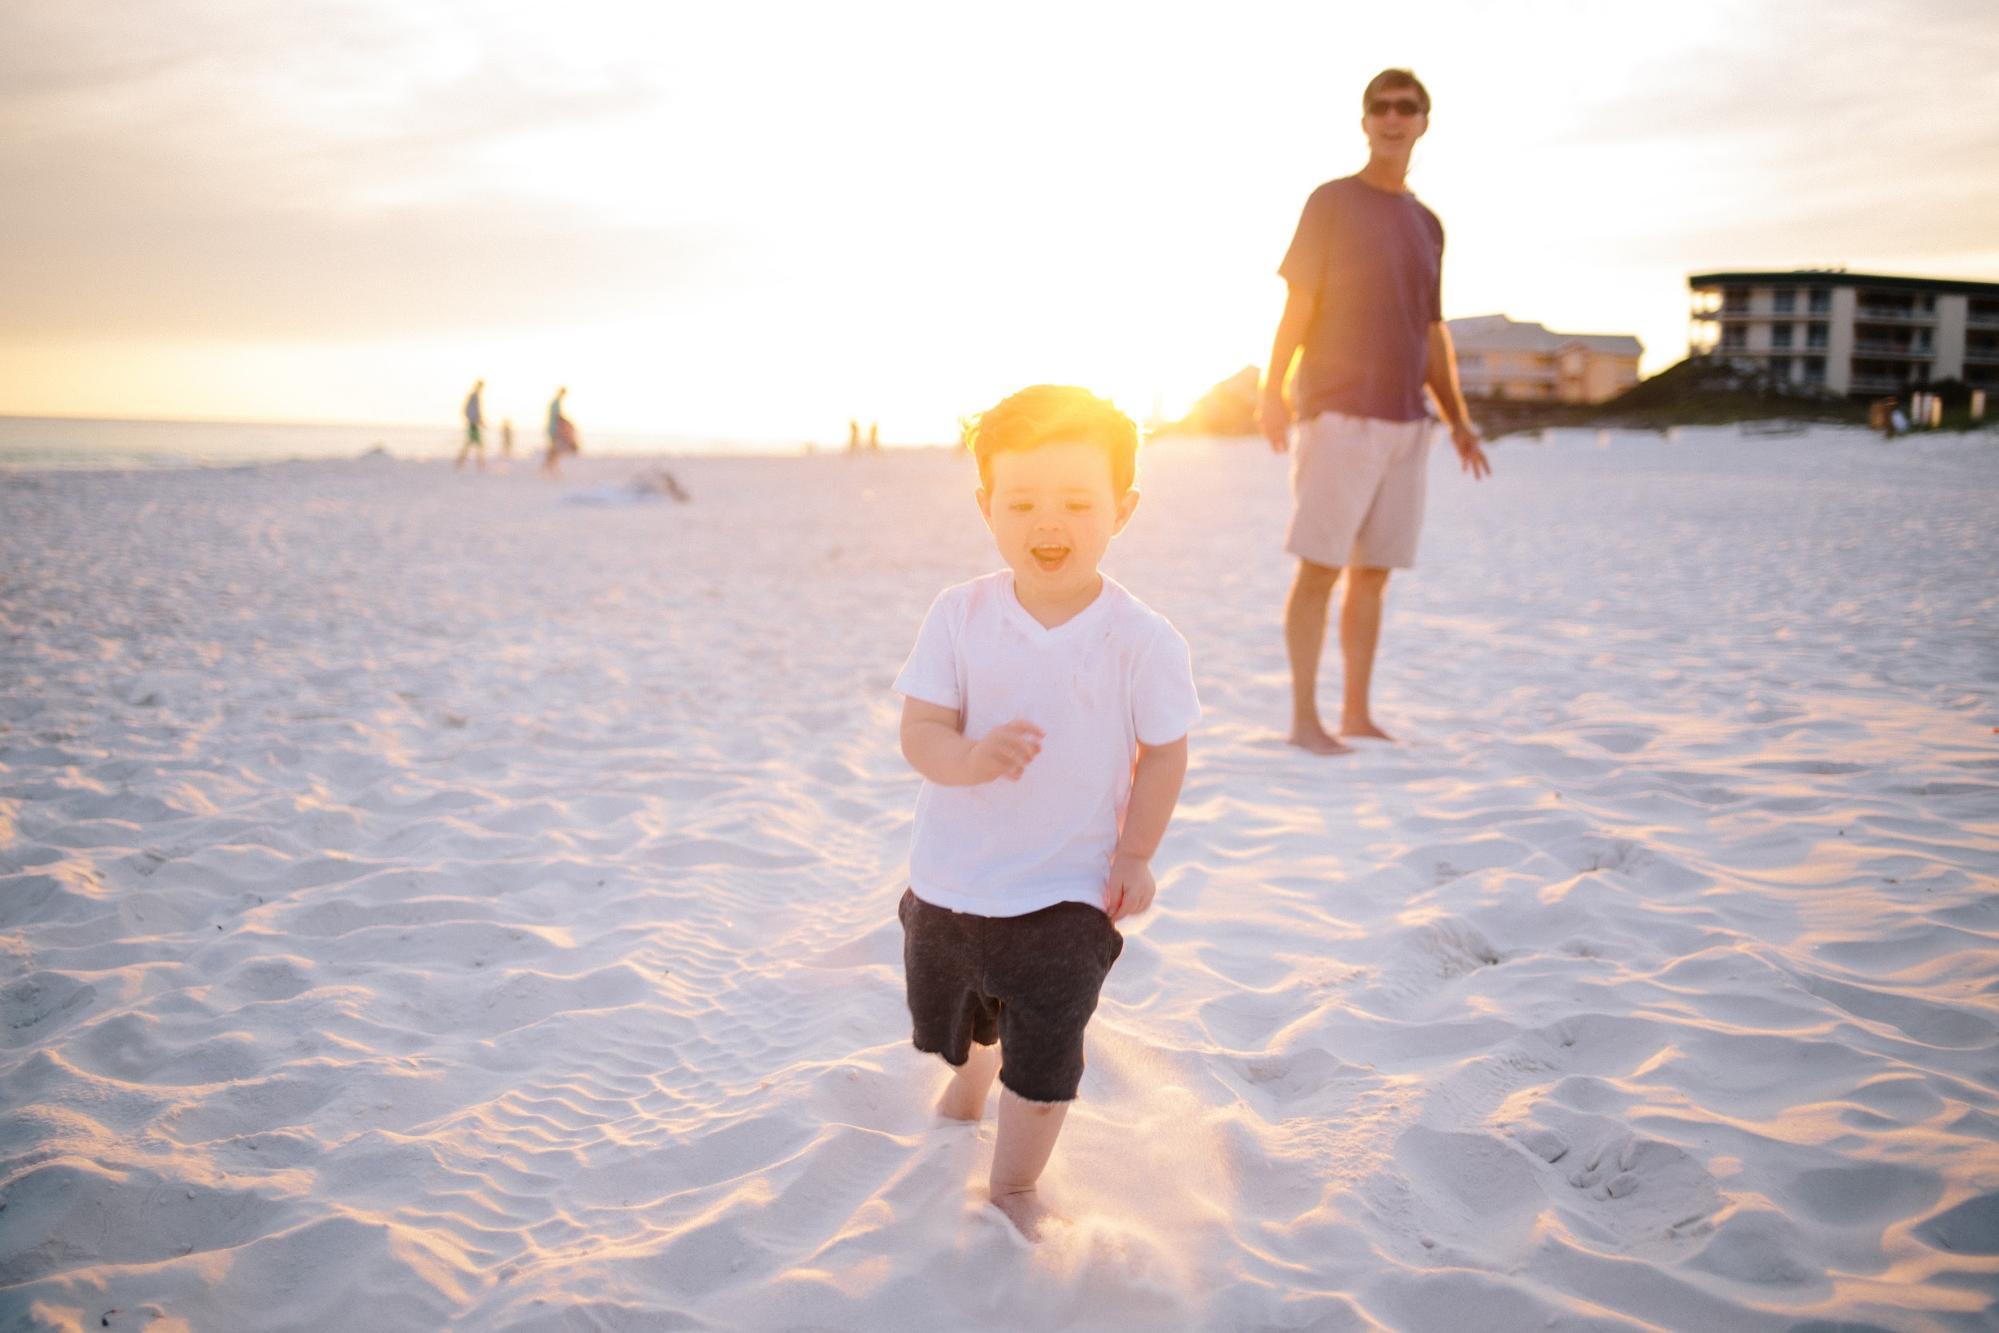 toddler running from parent body language